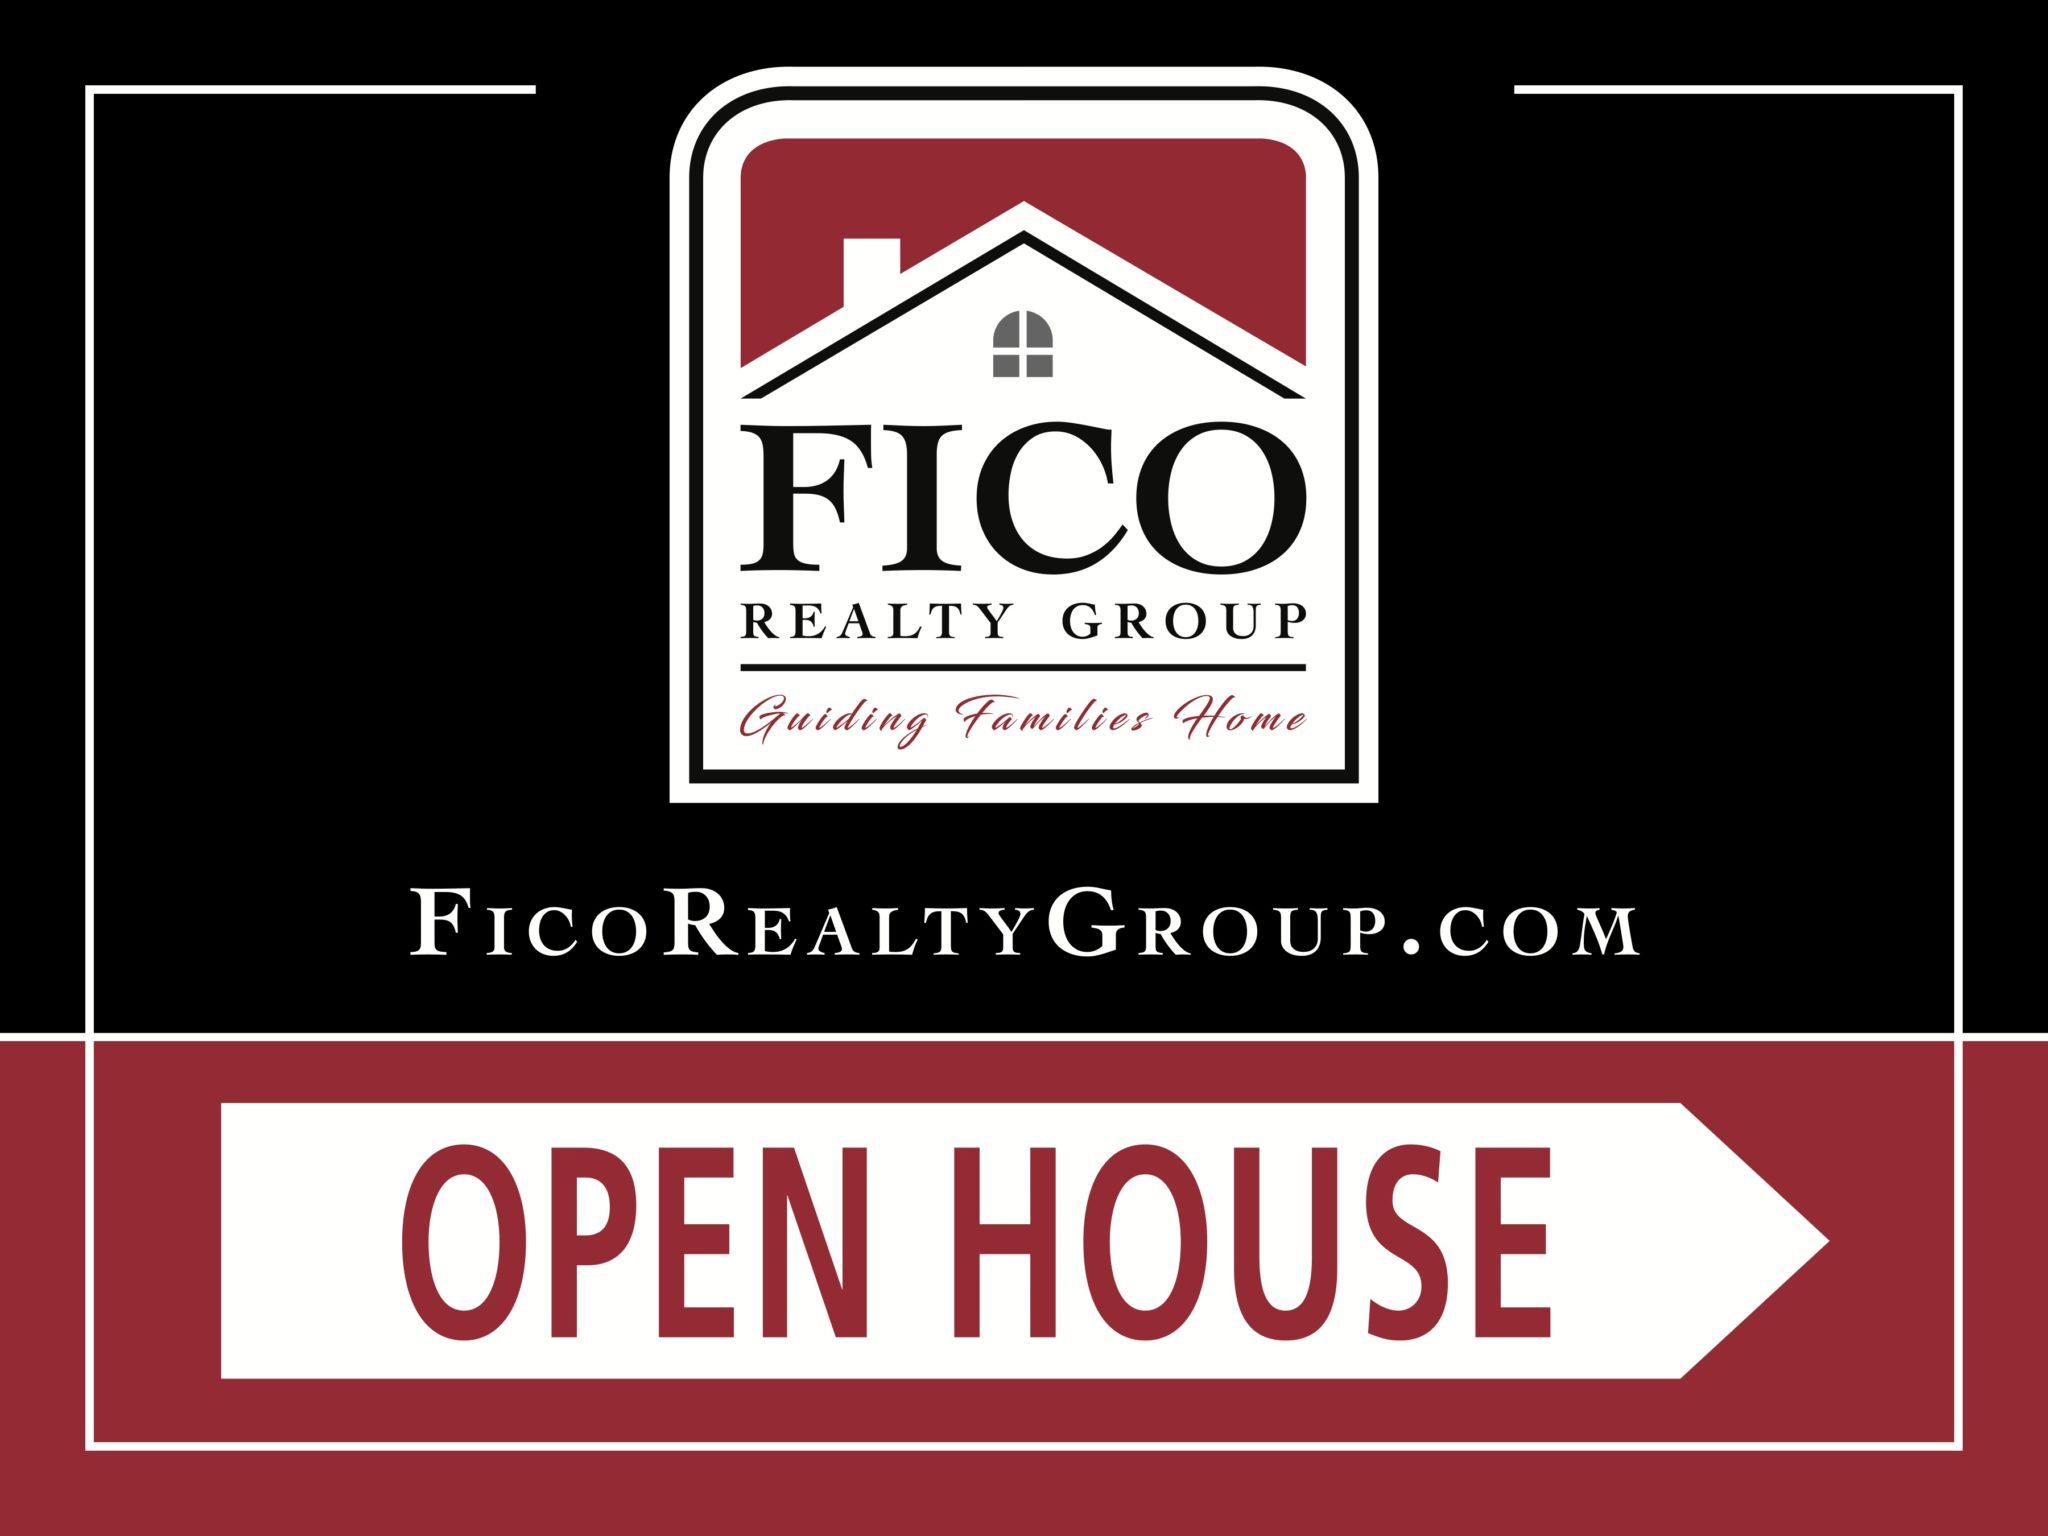 Open House - 208 Catamount Road Tewksbury, MA. Sunday, June 25th